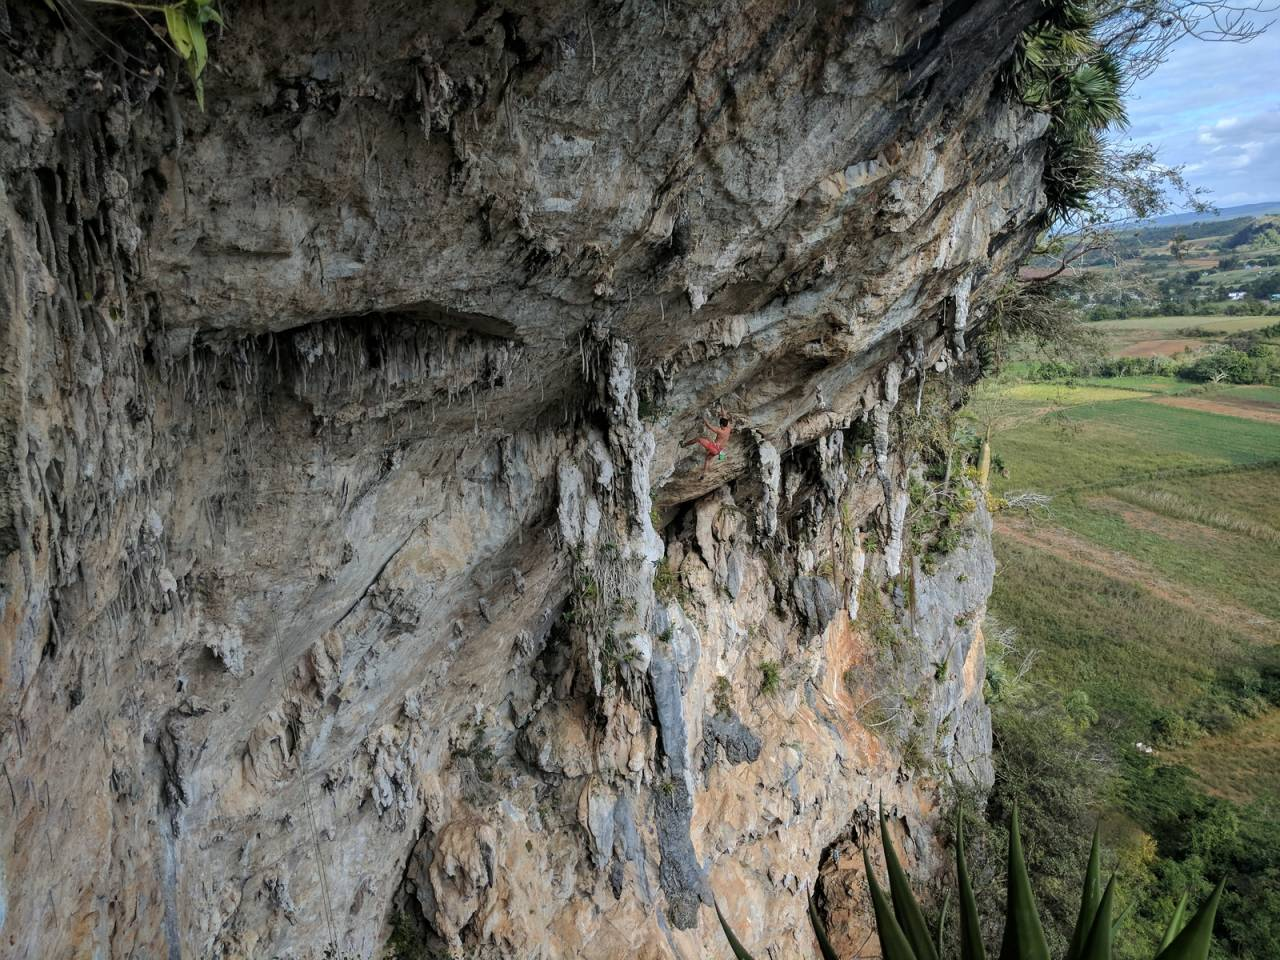 klatring cuba fjellklatring ingrid faldnes iver gjelstenli